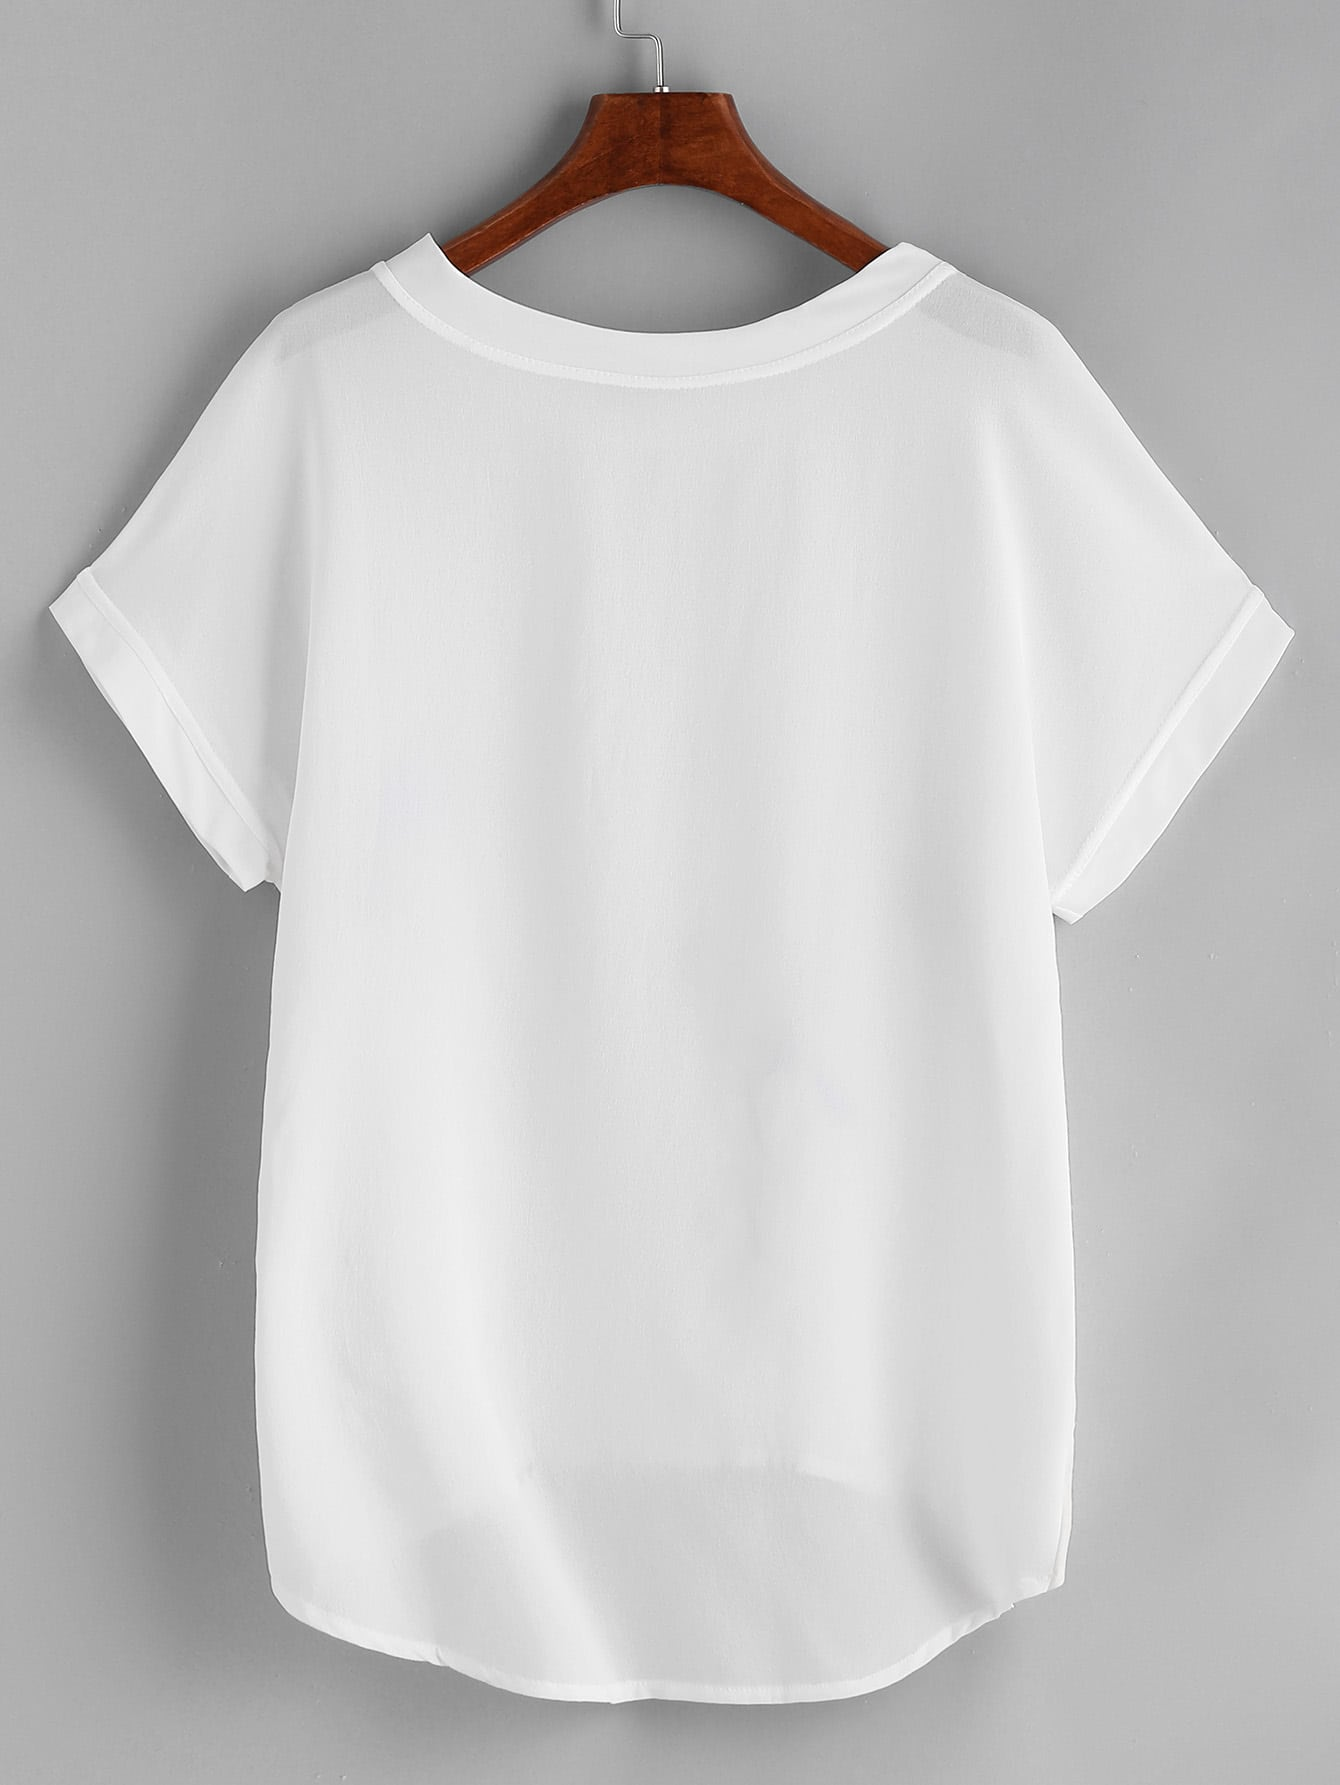 blouse170328103_2